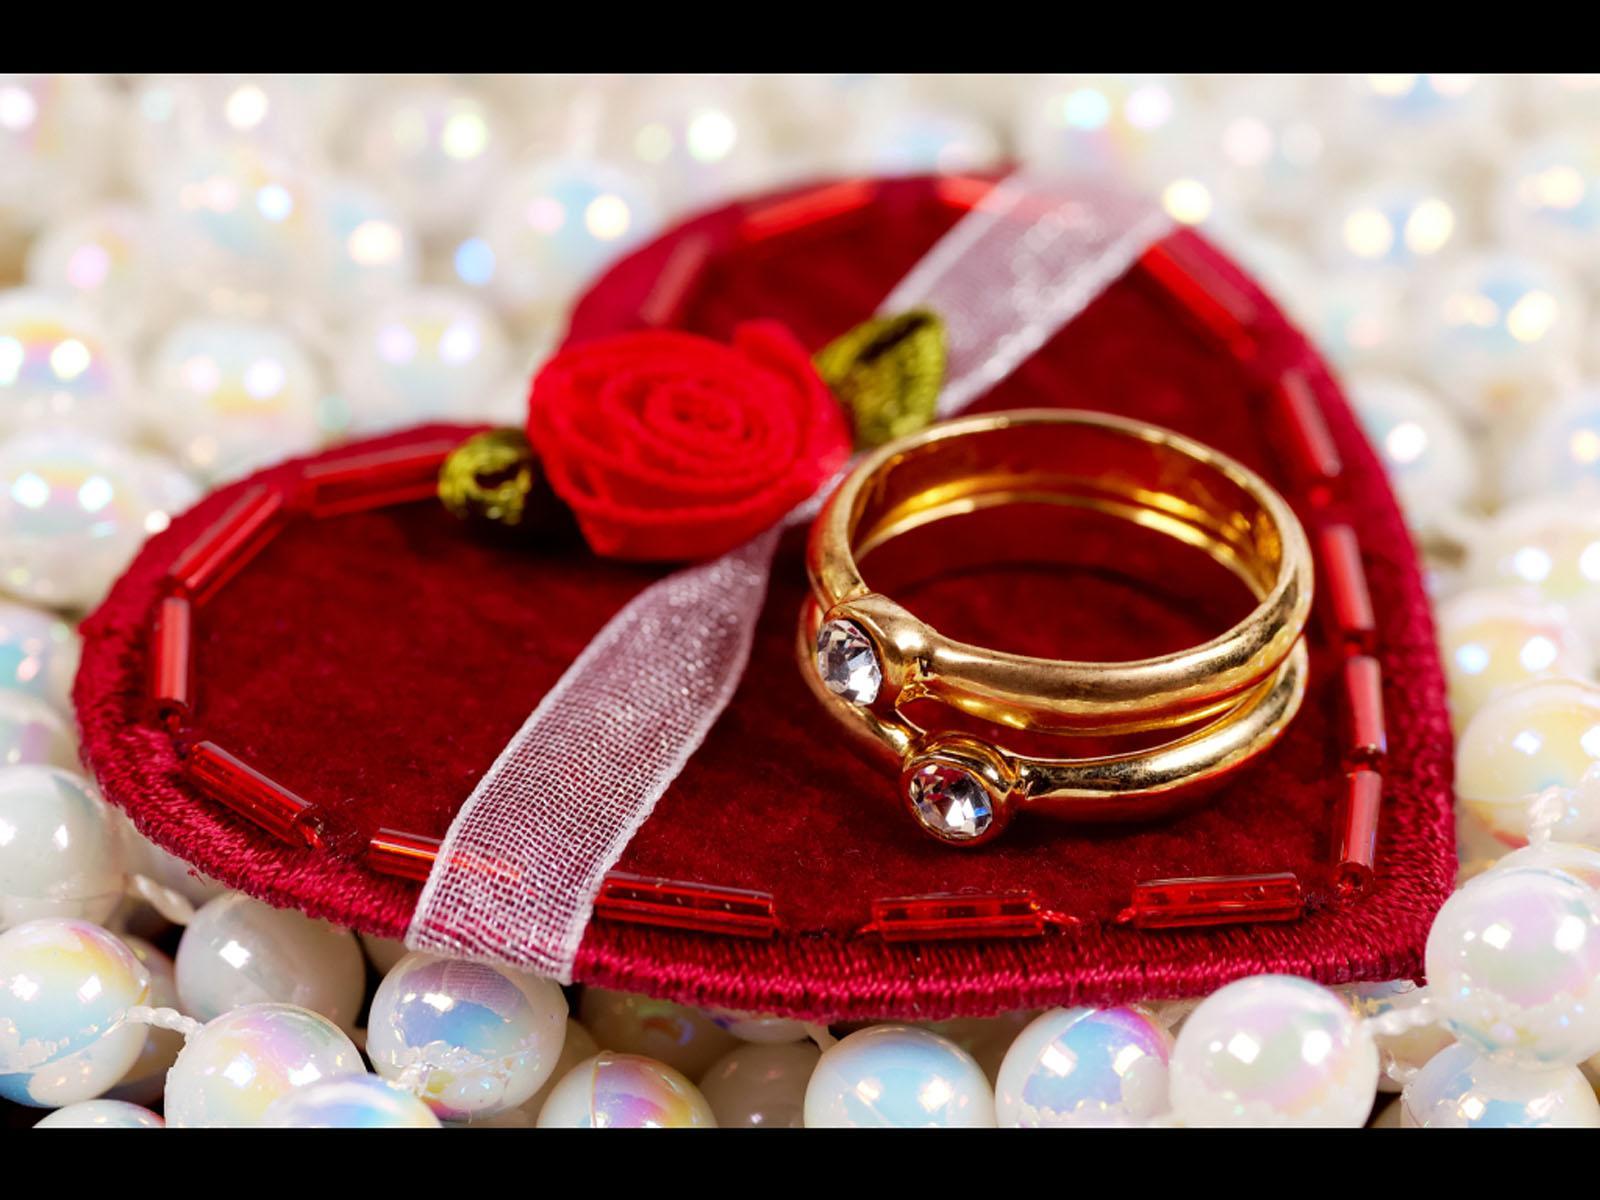 http://wondrouspics.com/wp-content/uploads/2013/02/valentines-day-gifts-13.jpg